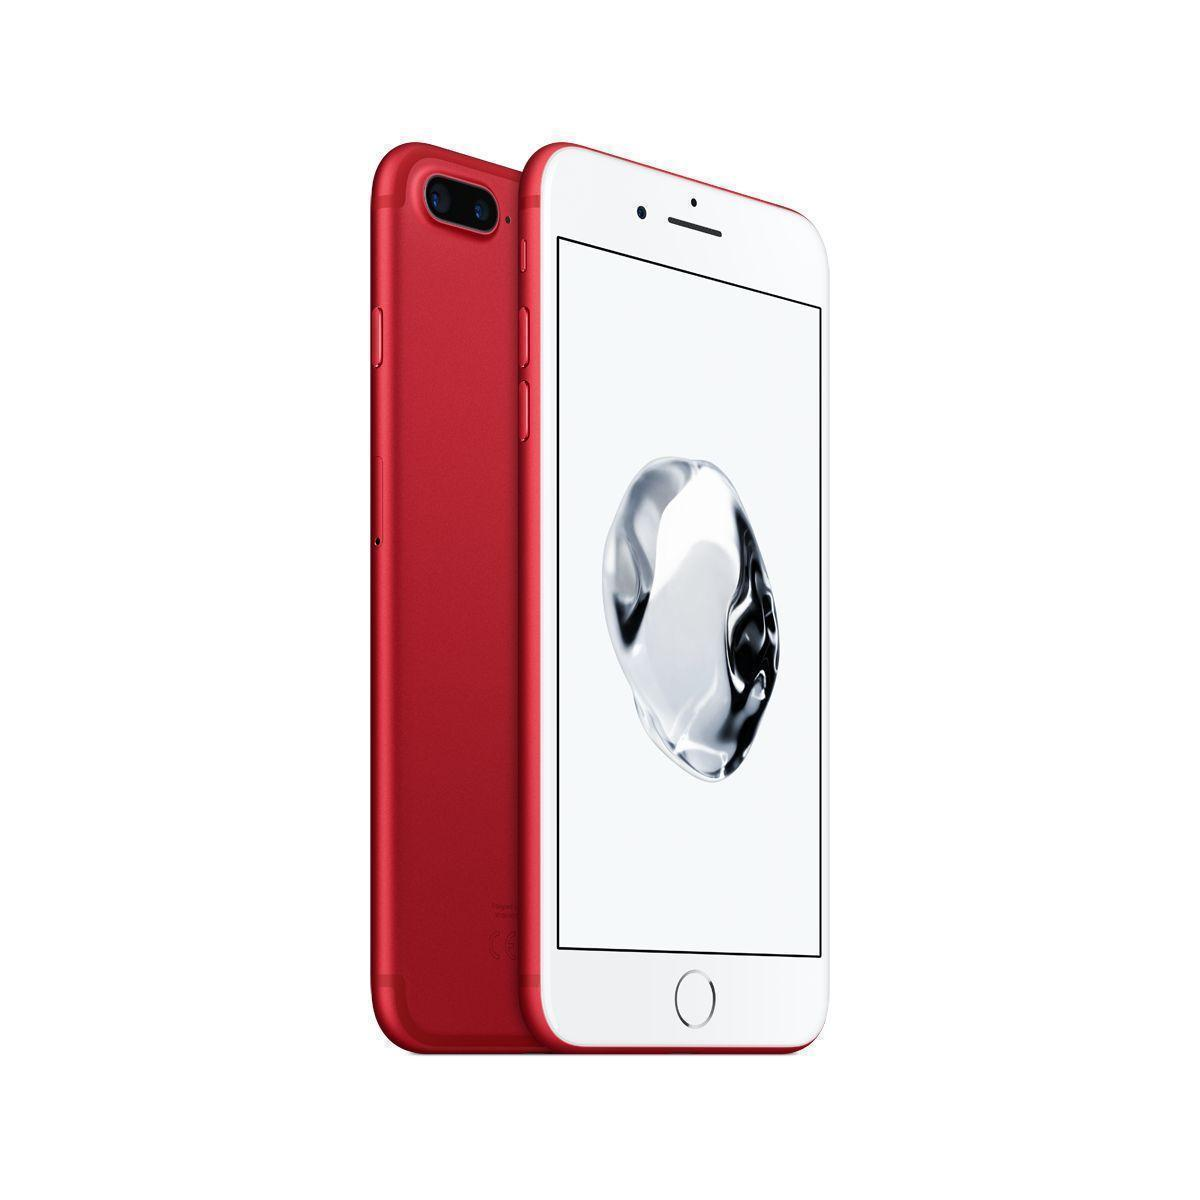 iphone 7 plus 128 gb rot ohne vertrag gebraucht. Black Bedroom Furniture Sets. Home Design Ideas